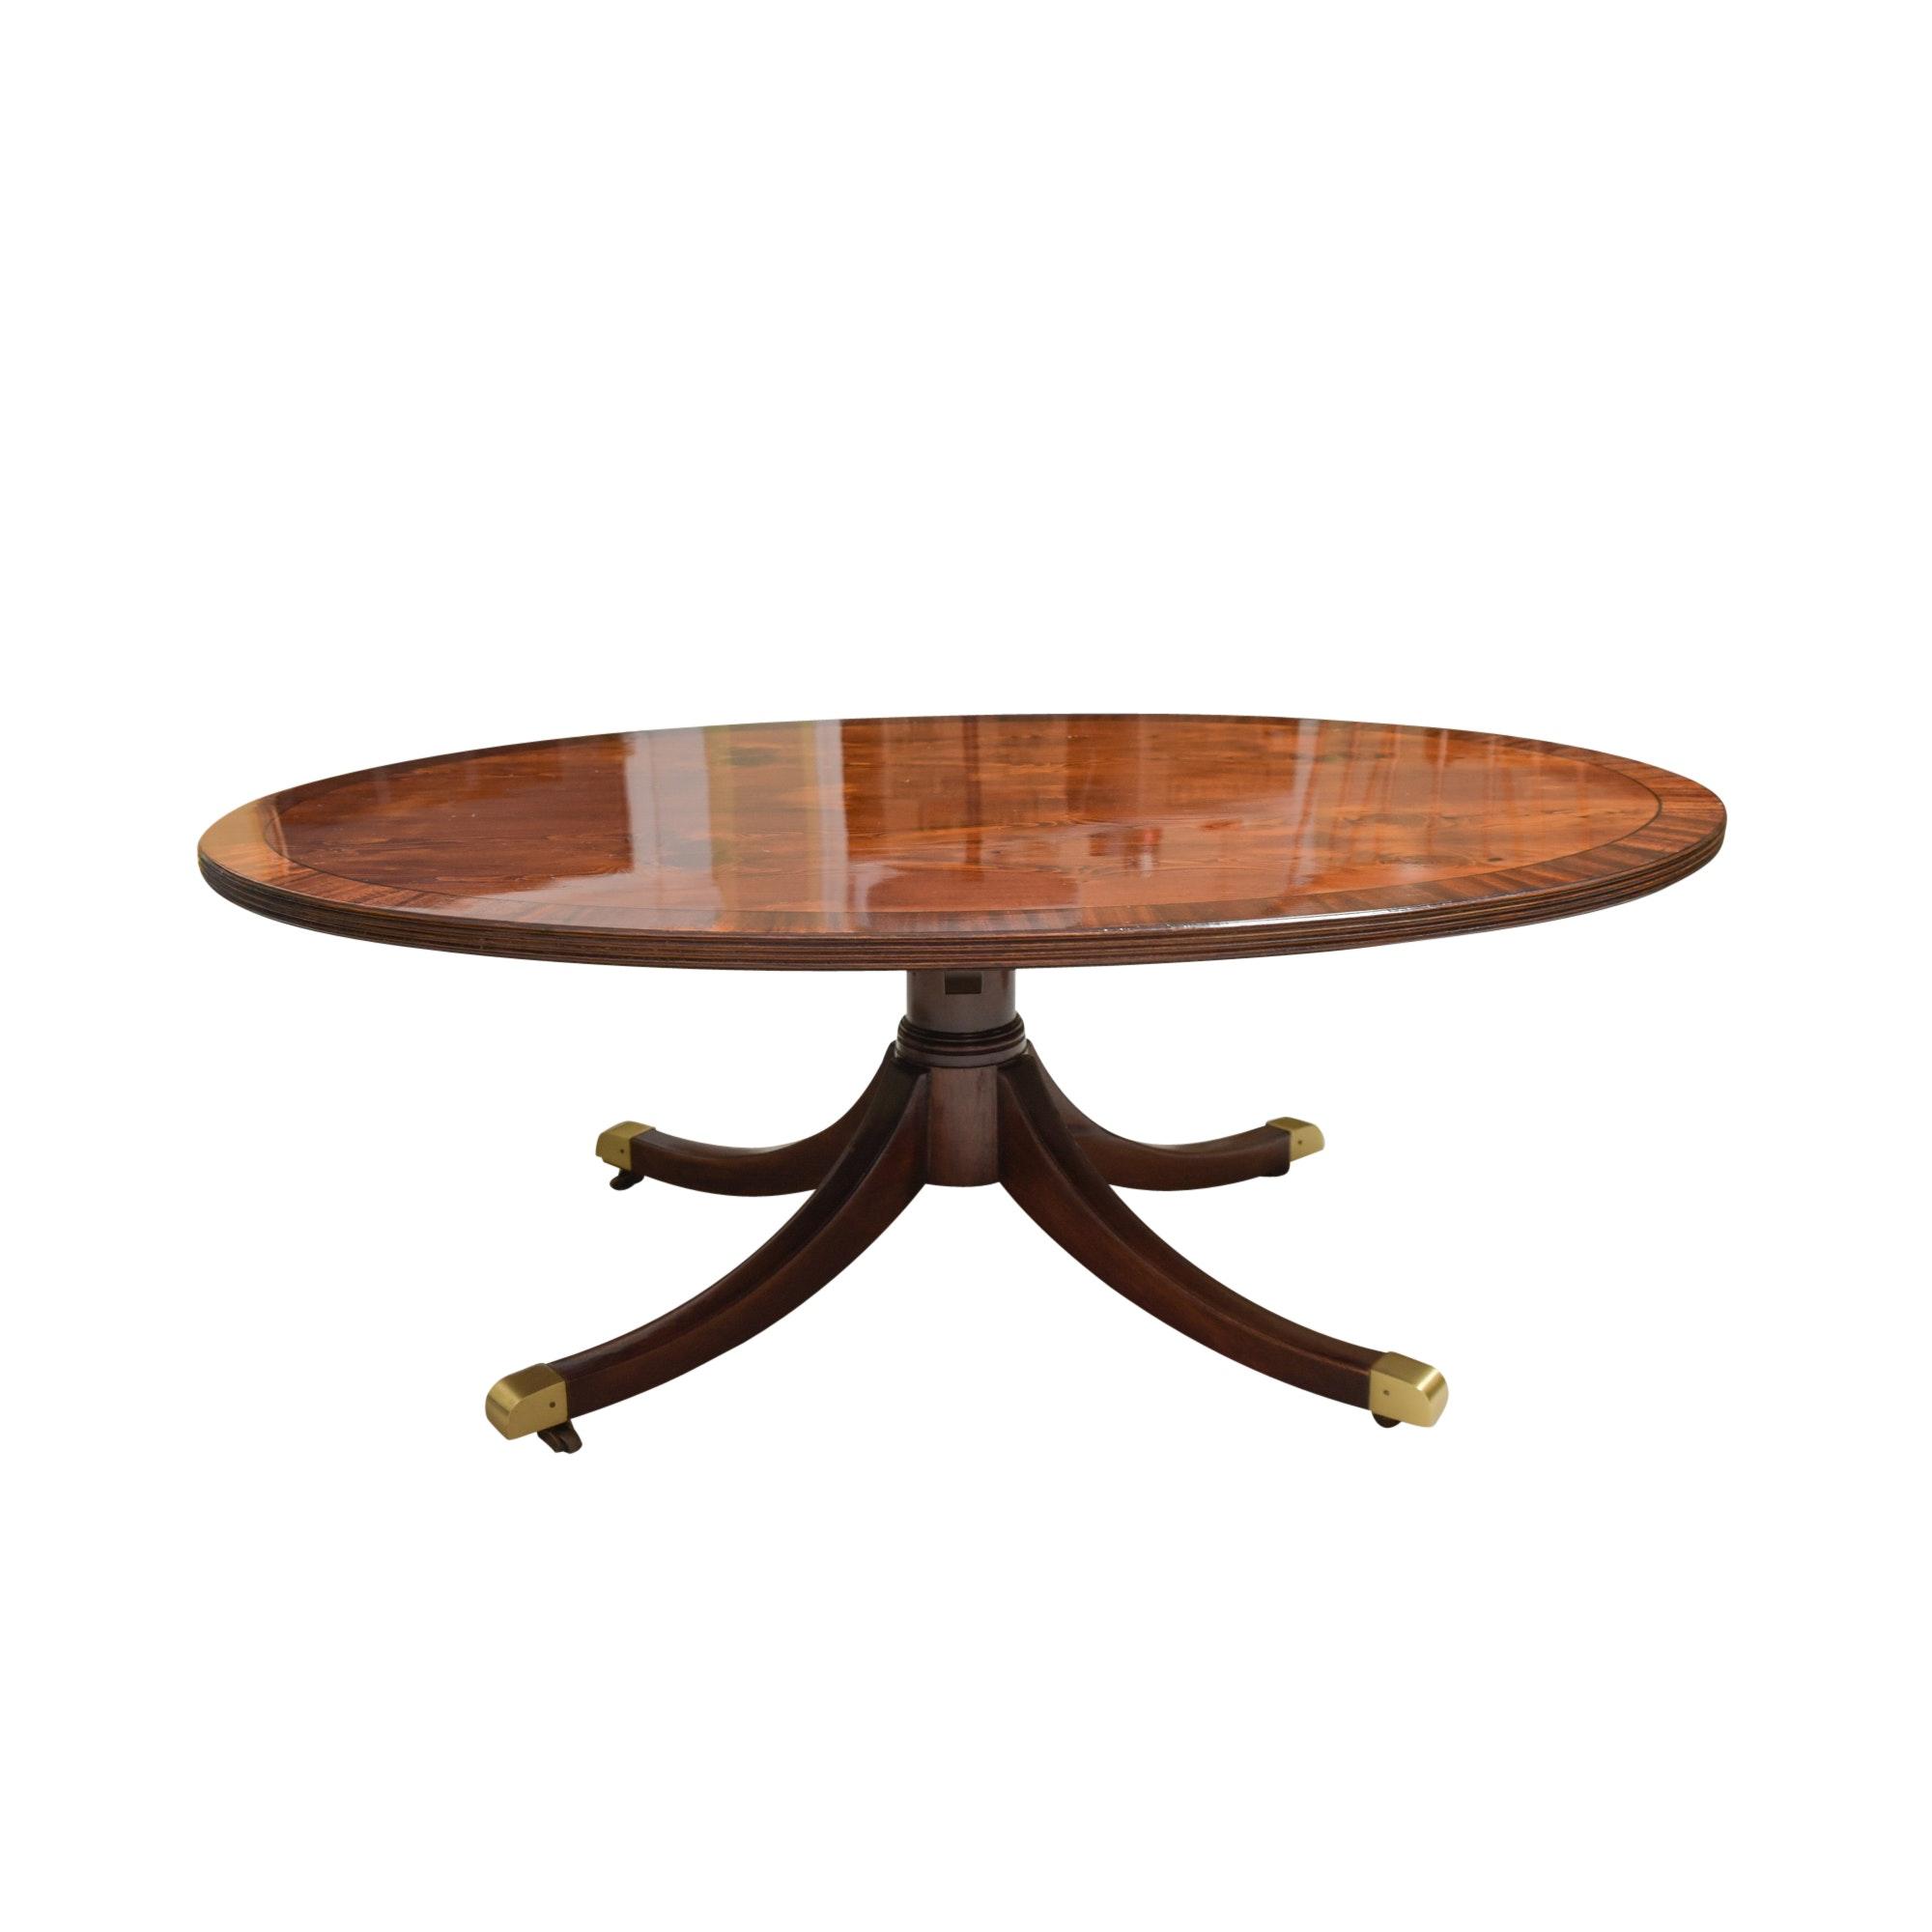 Vintage Regency Style Coffee Table by Wm. A. Berkey Furniture